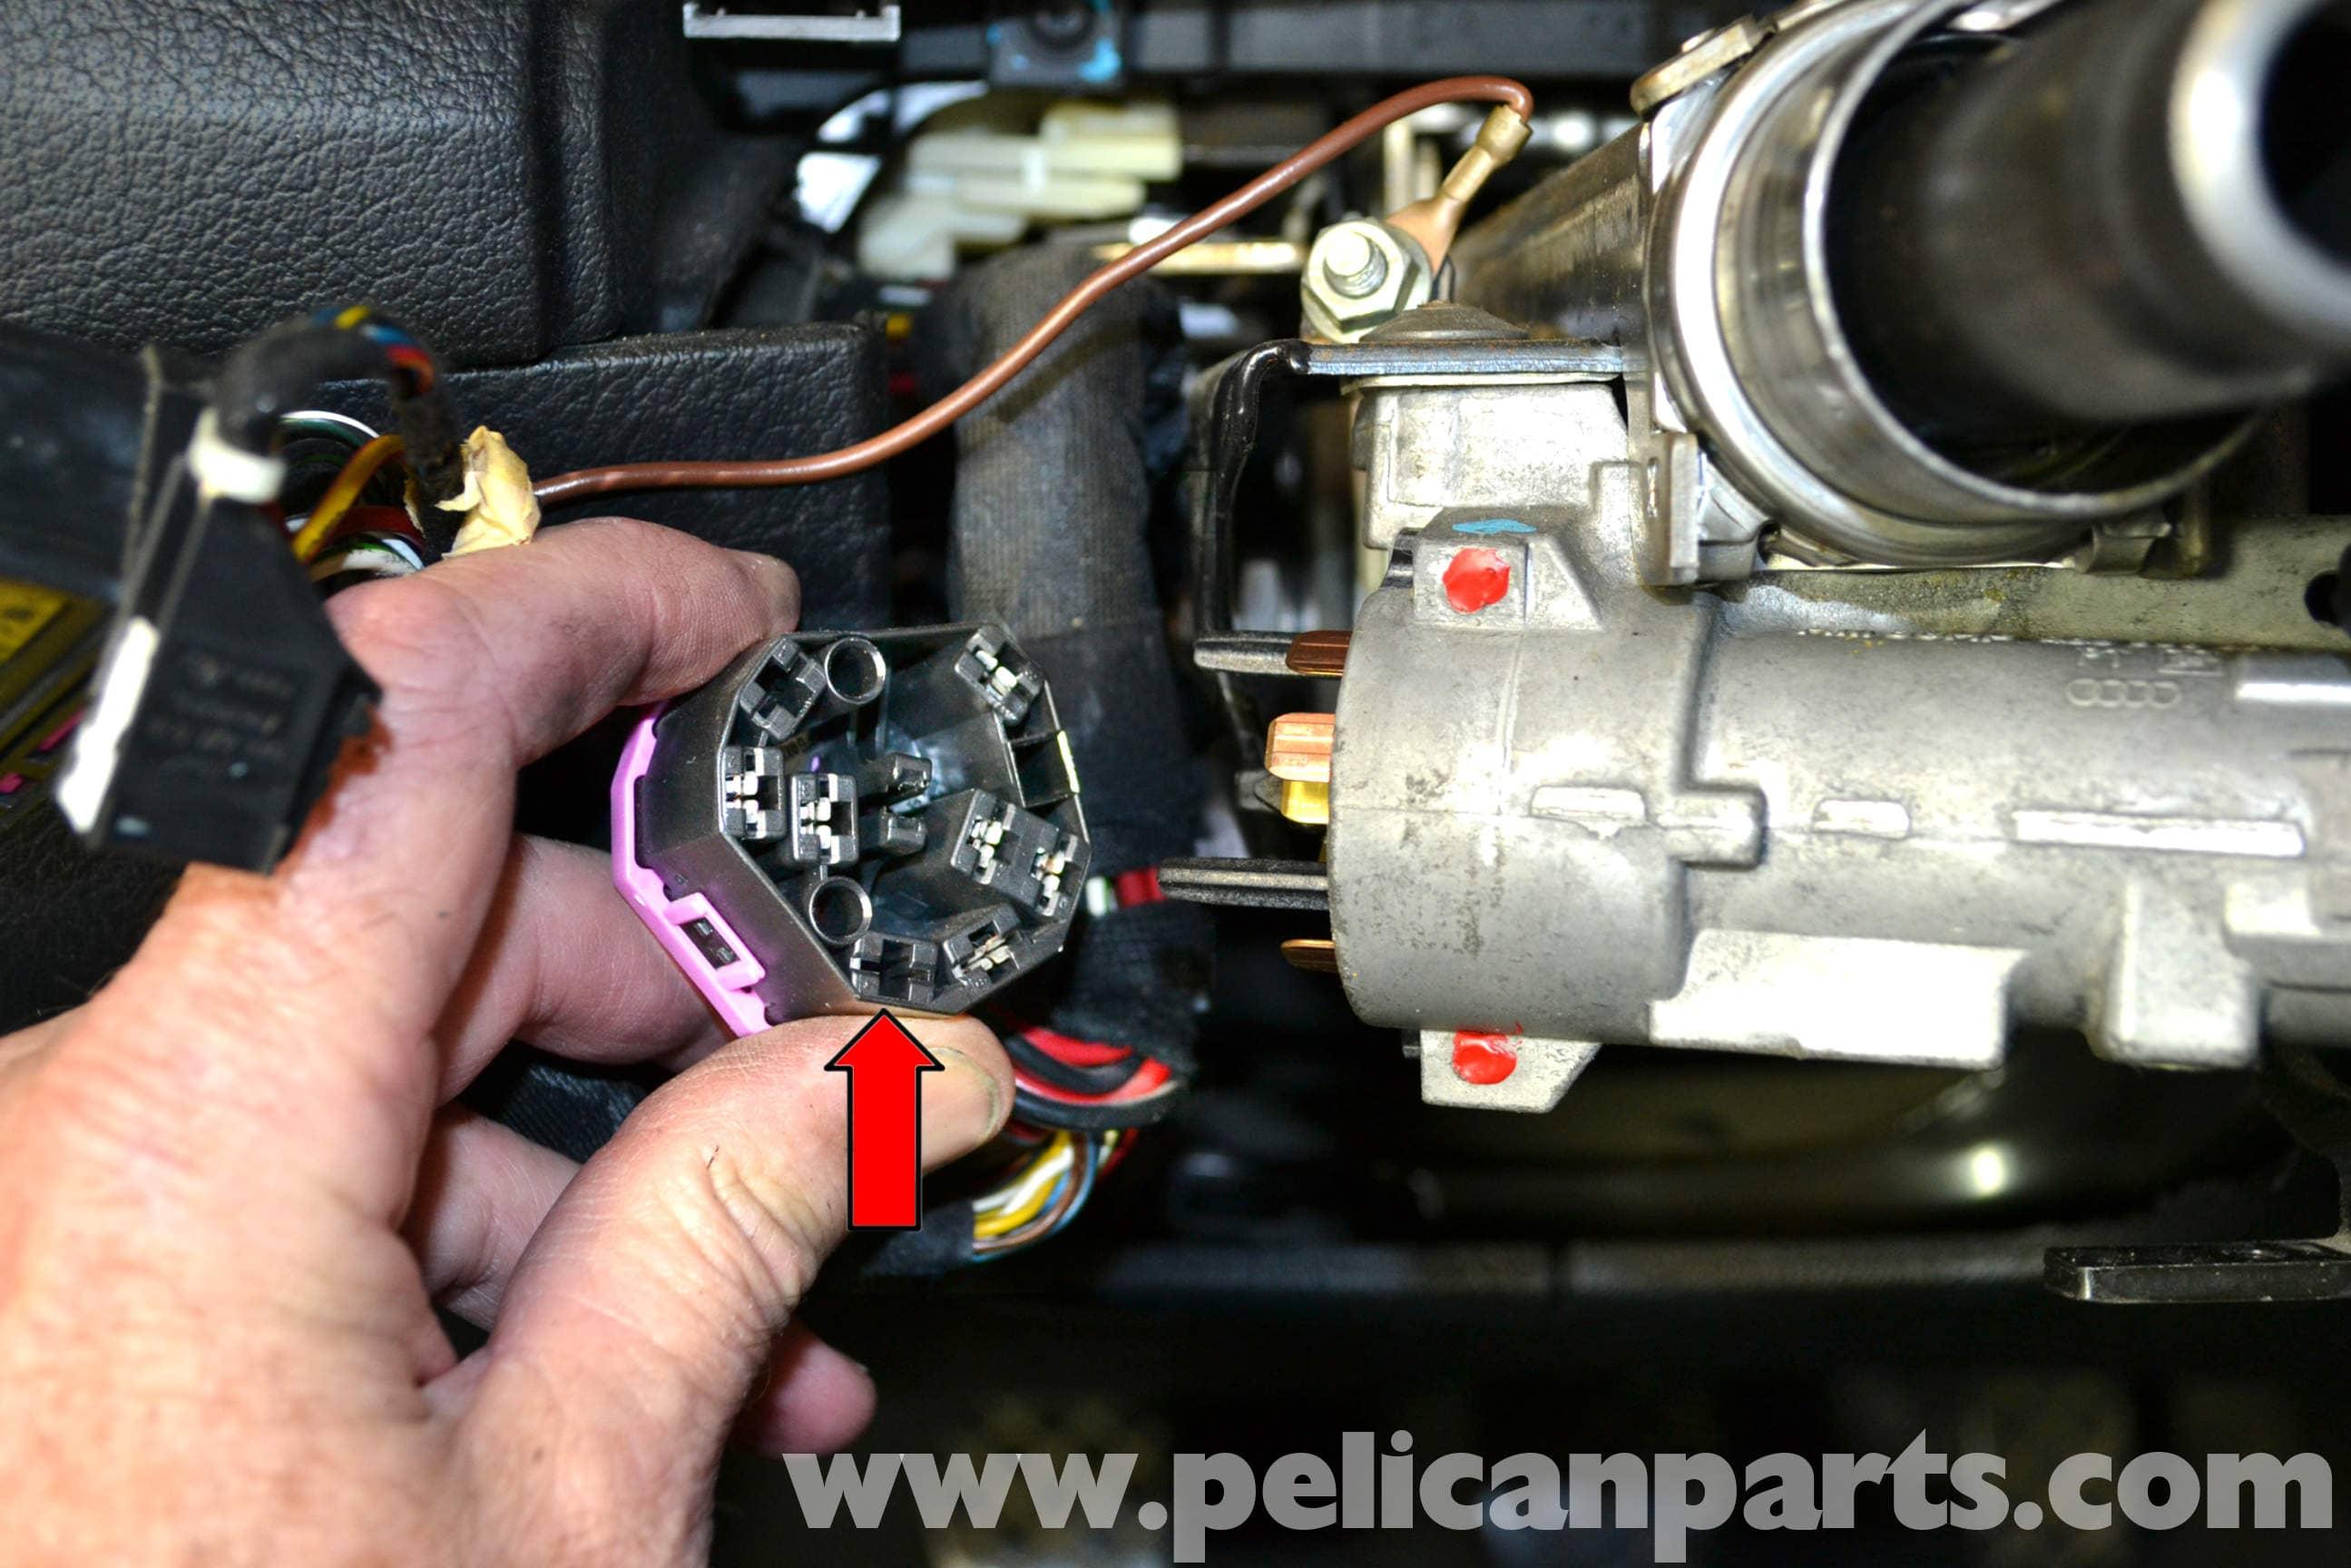 2010 Volkswagen Tiguan Fuse Box Diagram Volkswagen Golf Gti Mk Iv Ignition Switch And Lock